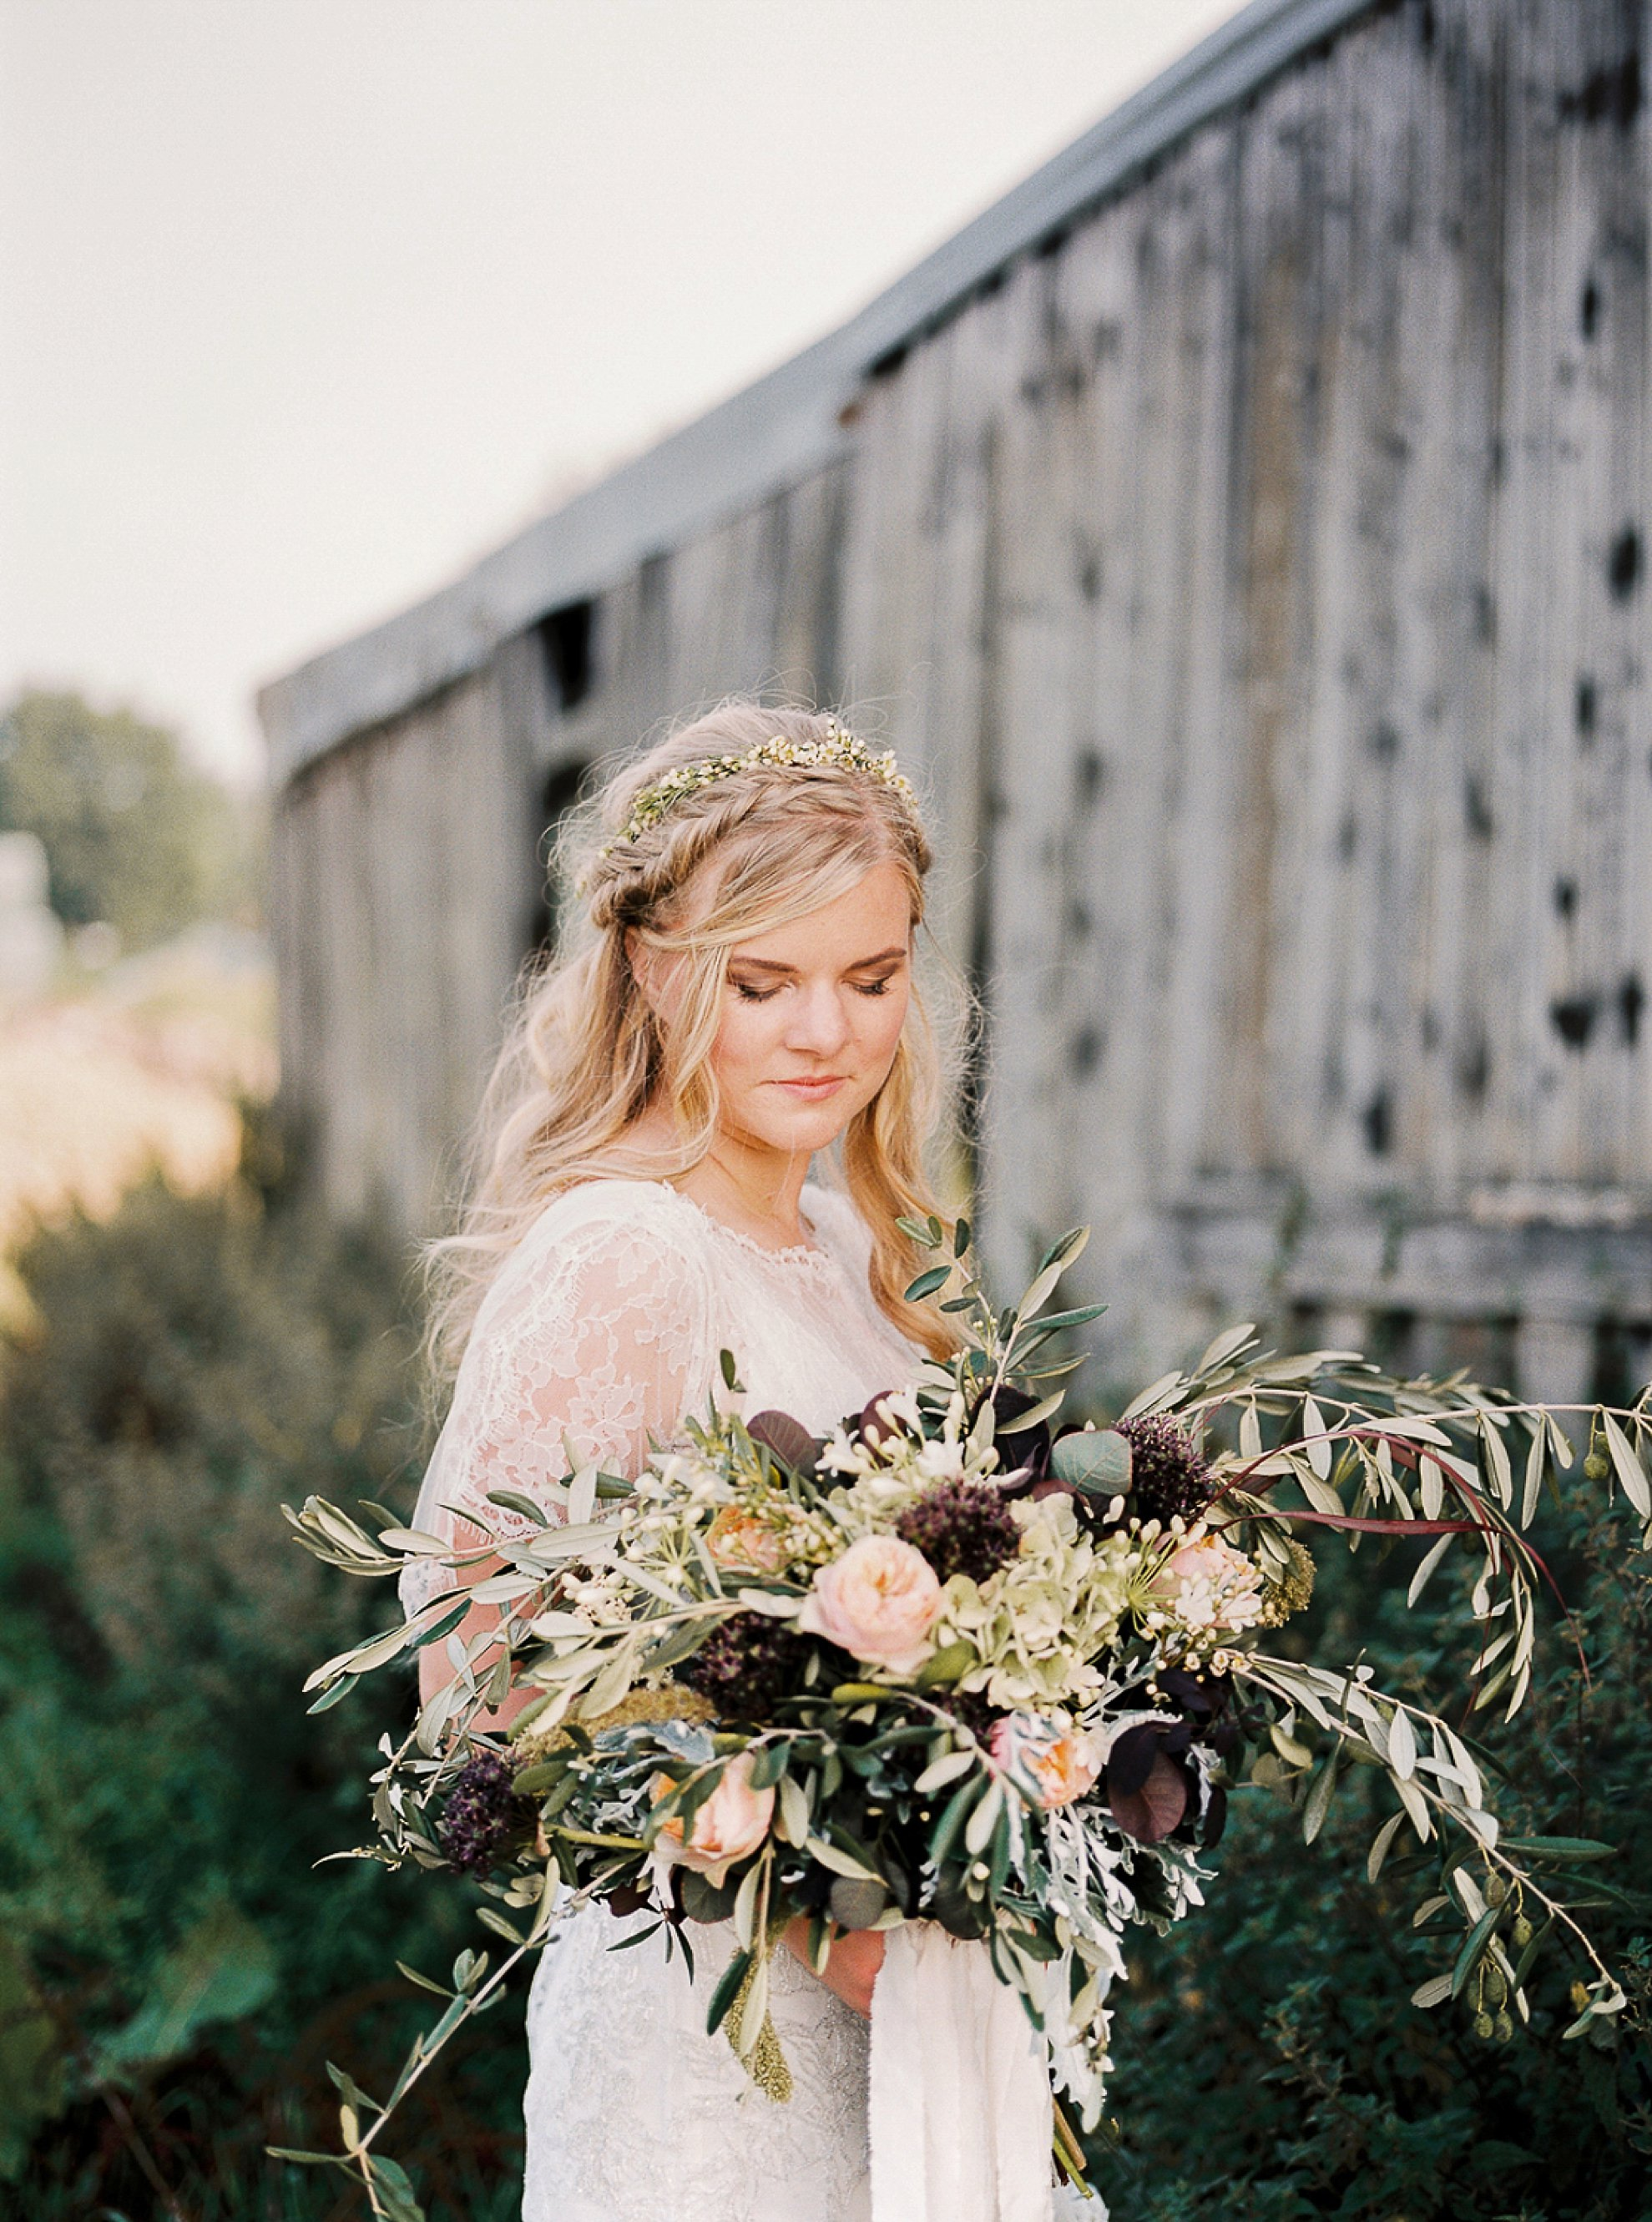 Amanda-Drost-Fotografie-Belgie-Photography-Wedding_0025.jpg